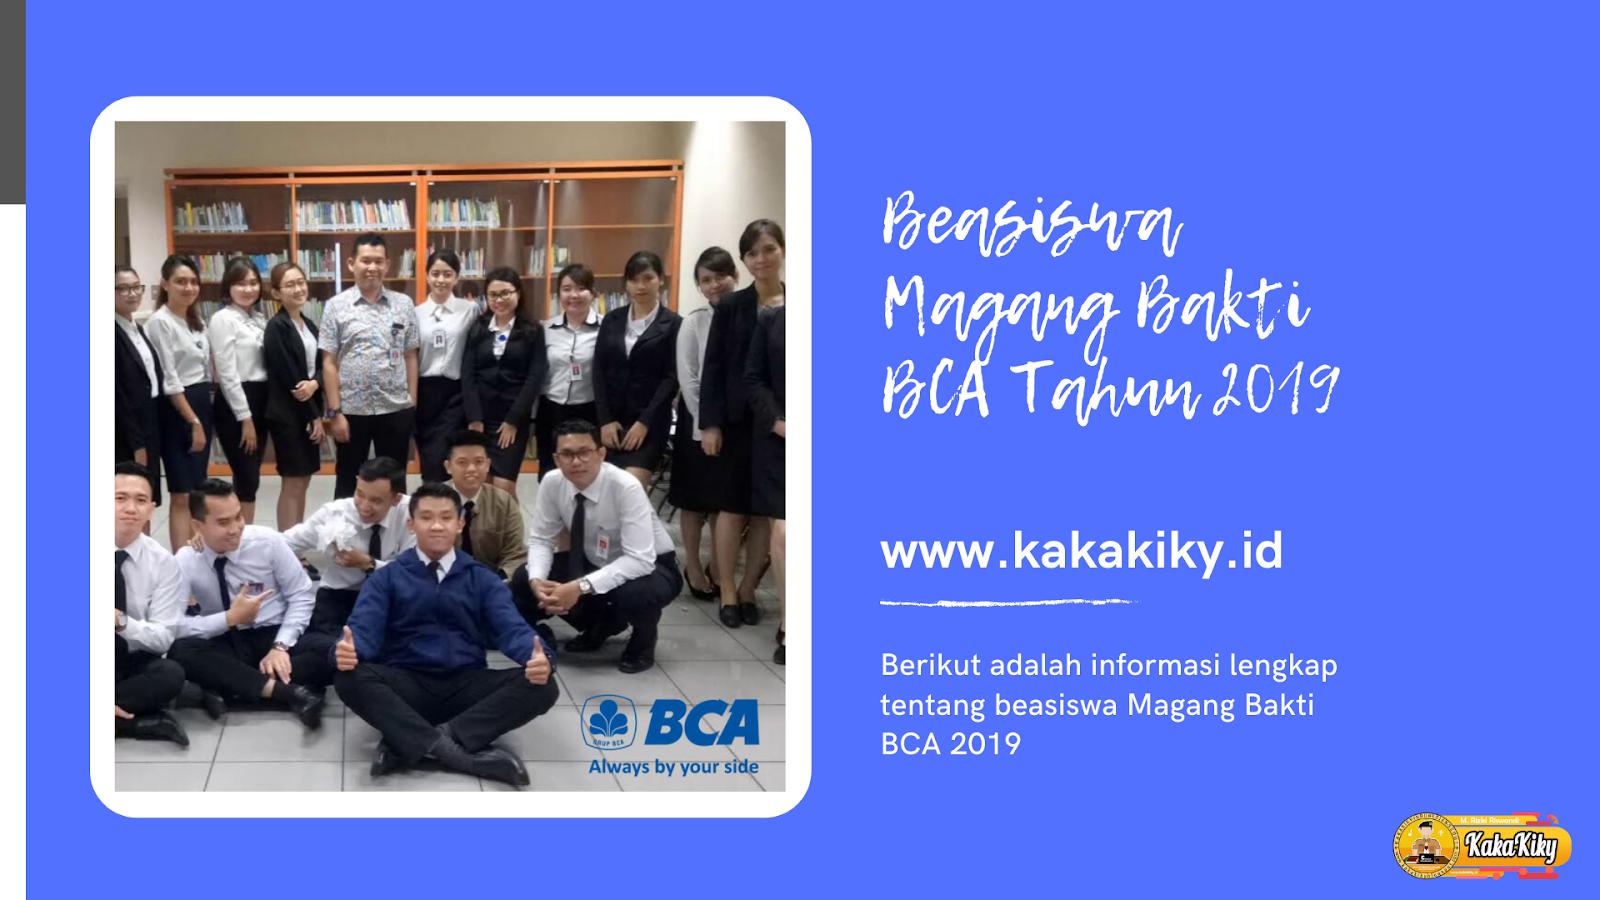 Beasiswa Magang Bakti Bca 2019 Untuk Sma Smk Dan Mahasiswa Kakakiky Blog Edukasi